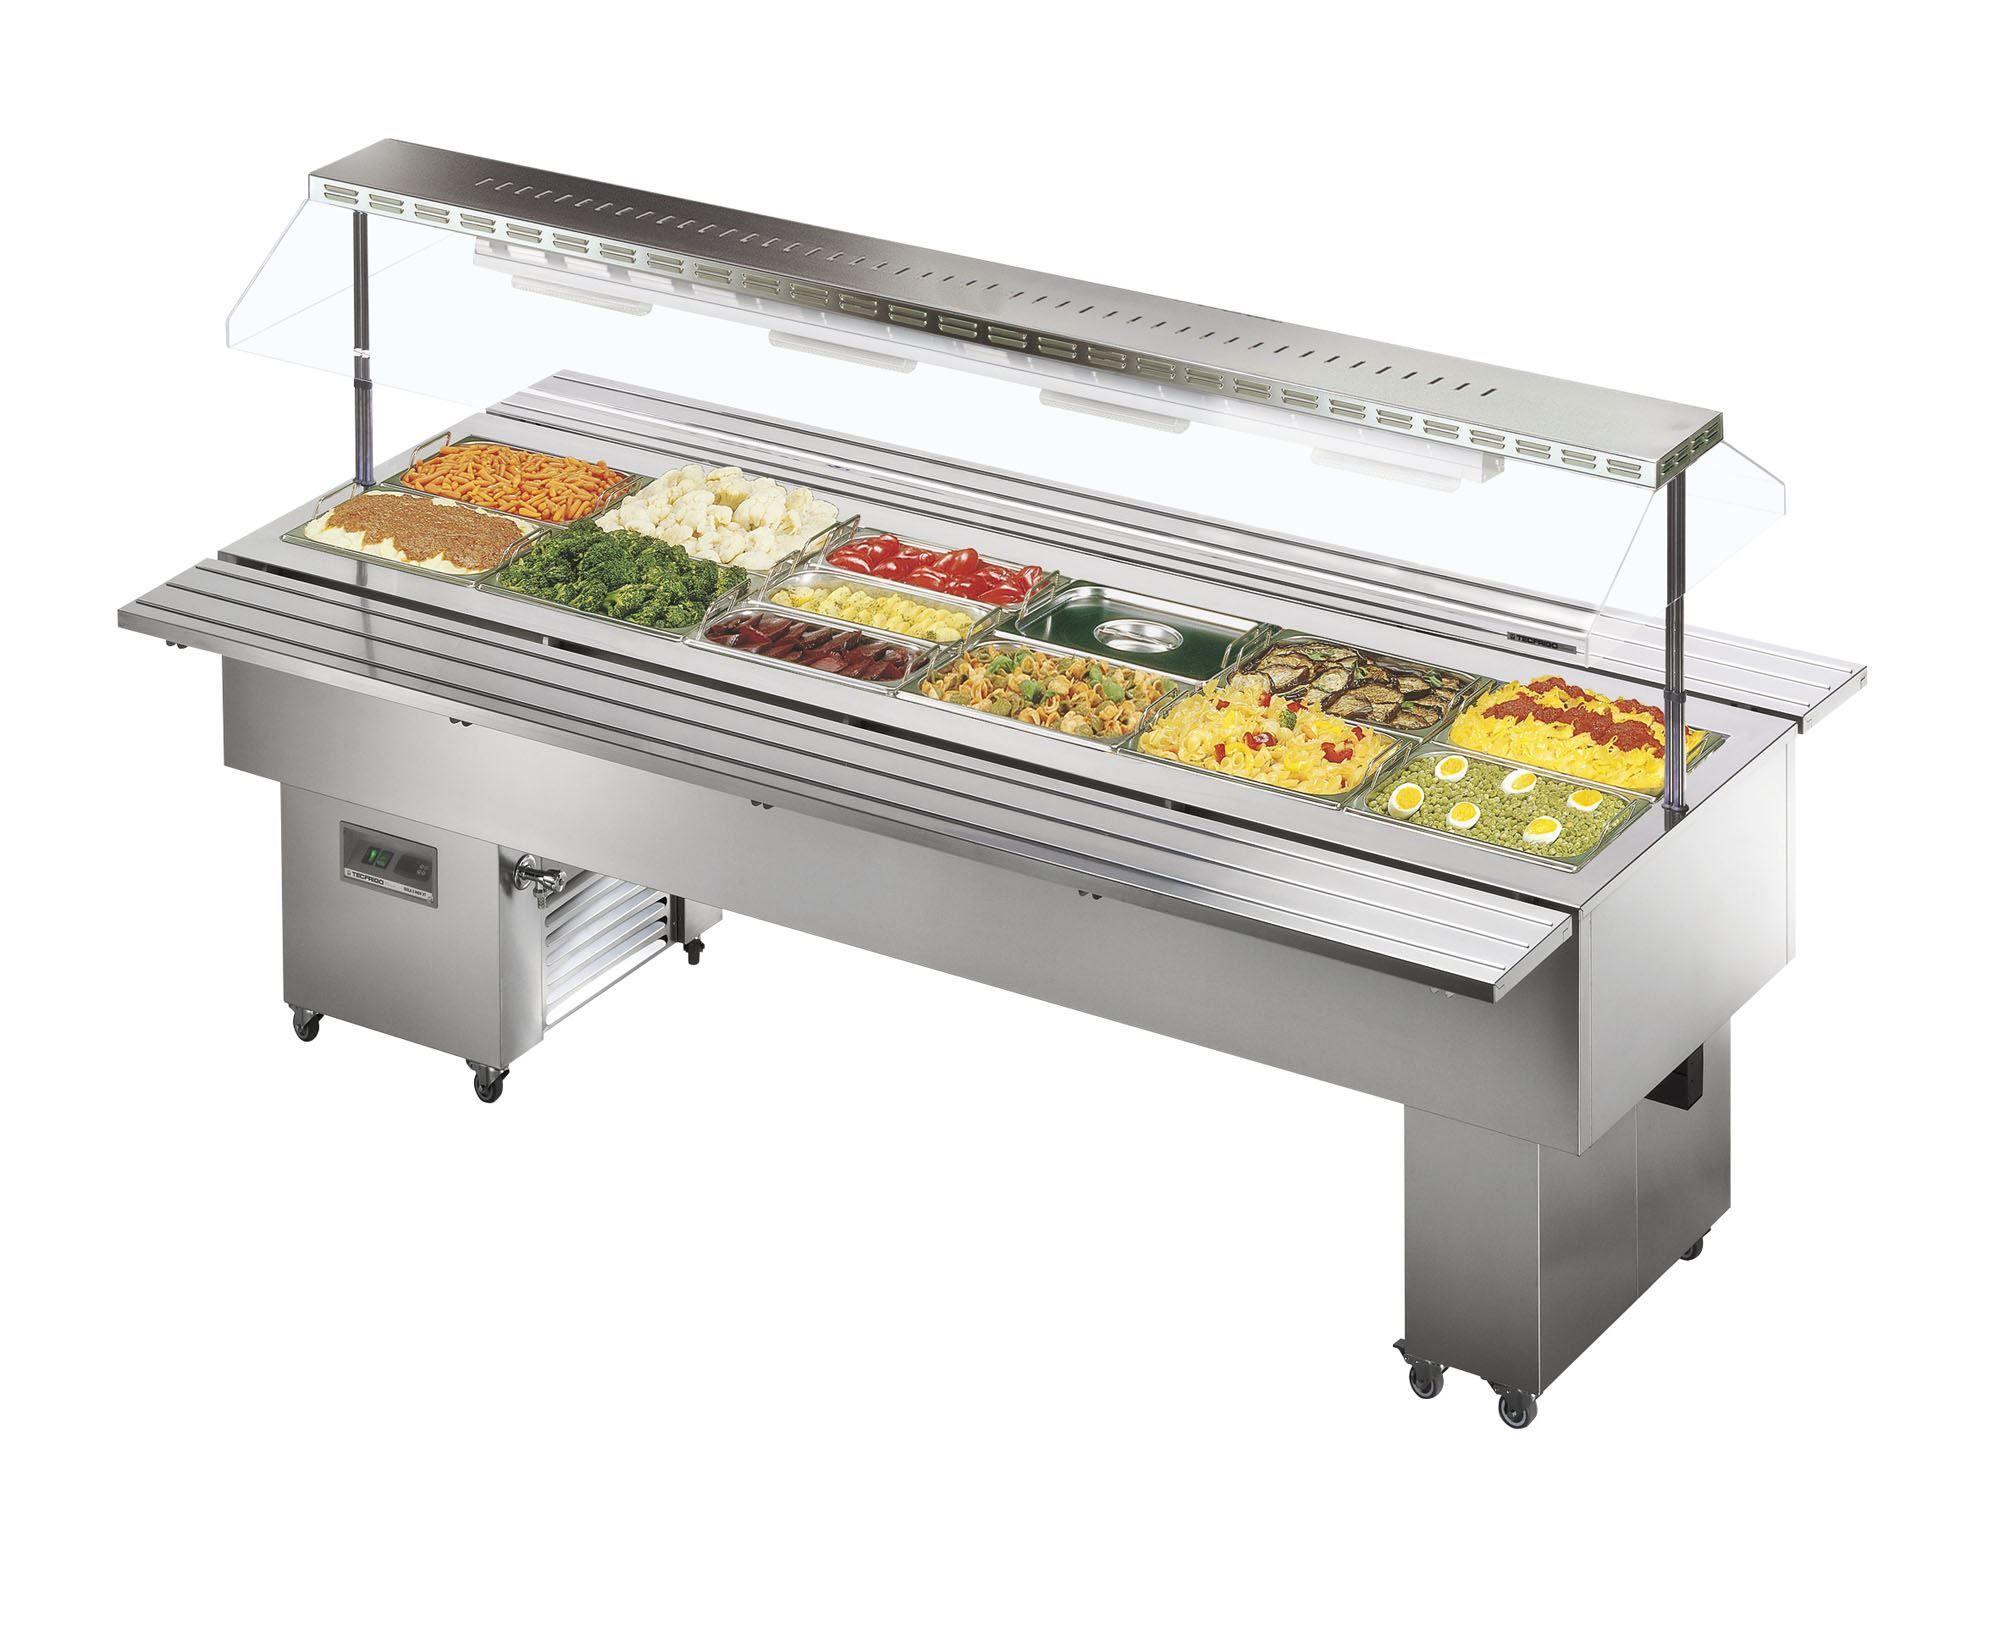 Image Result For Outdoor Salad Bar Images